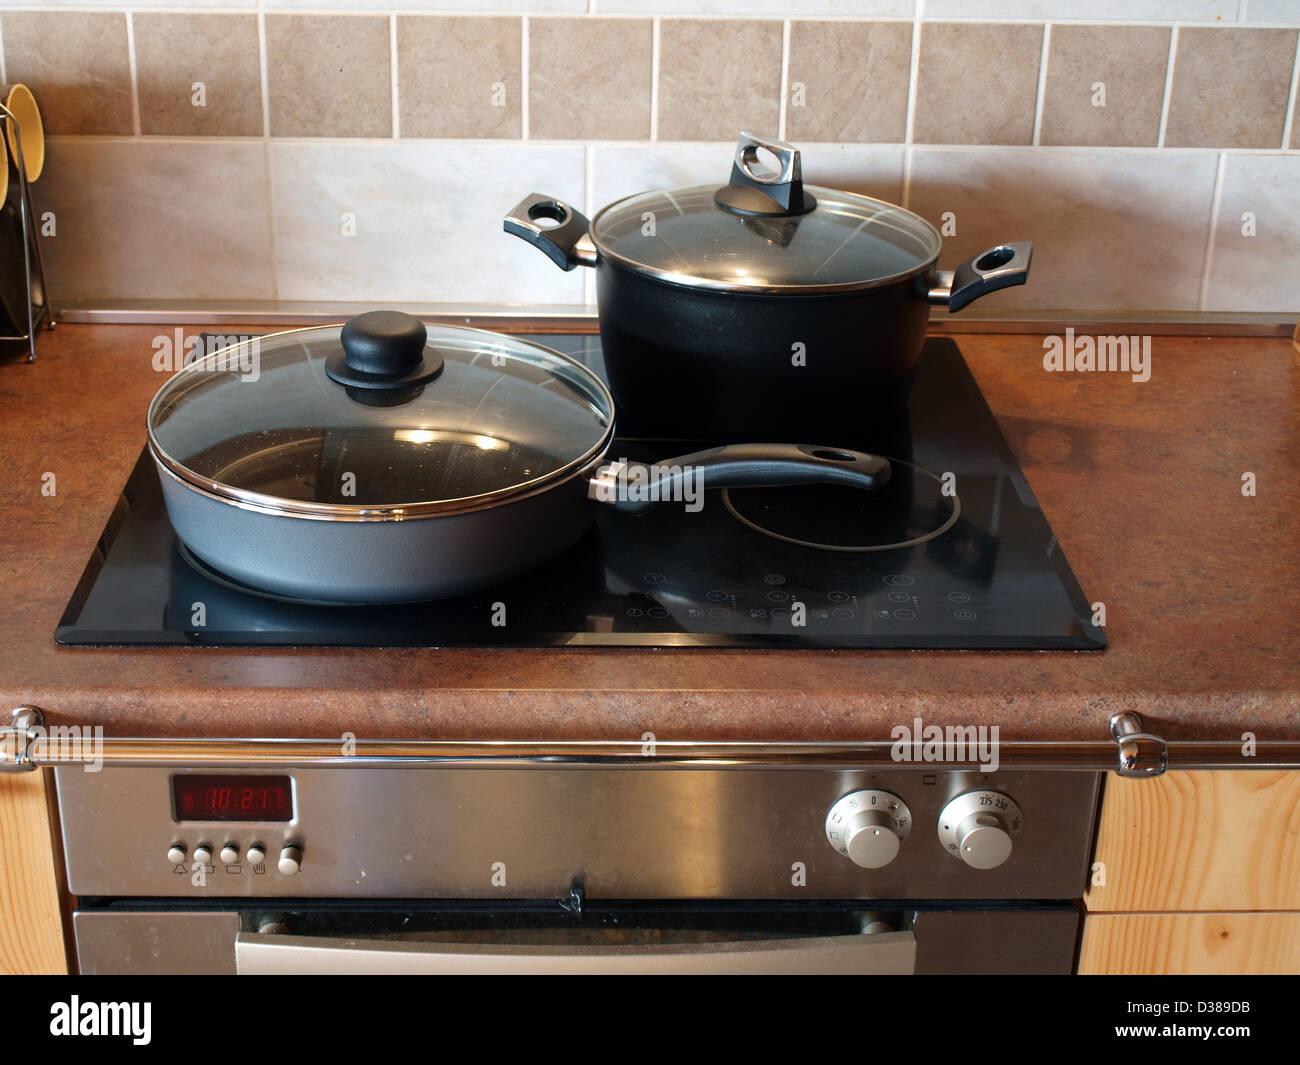 Modern ceramic electric stove in the kitchen - Stock Image